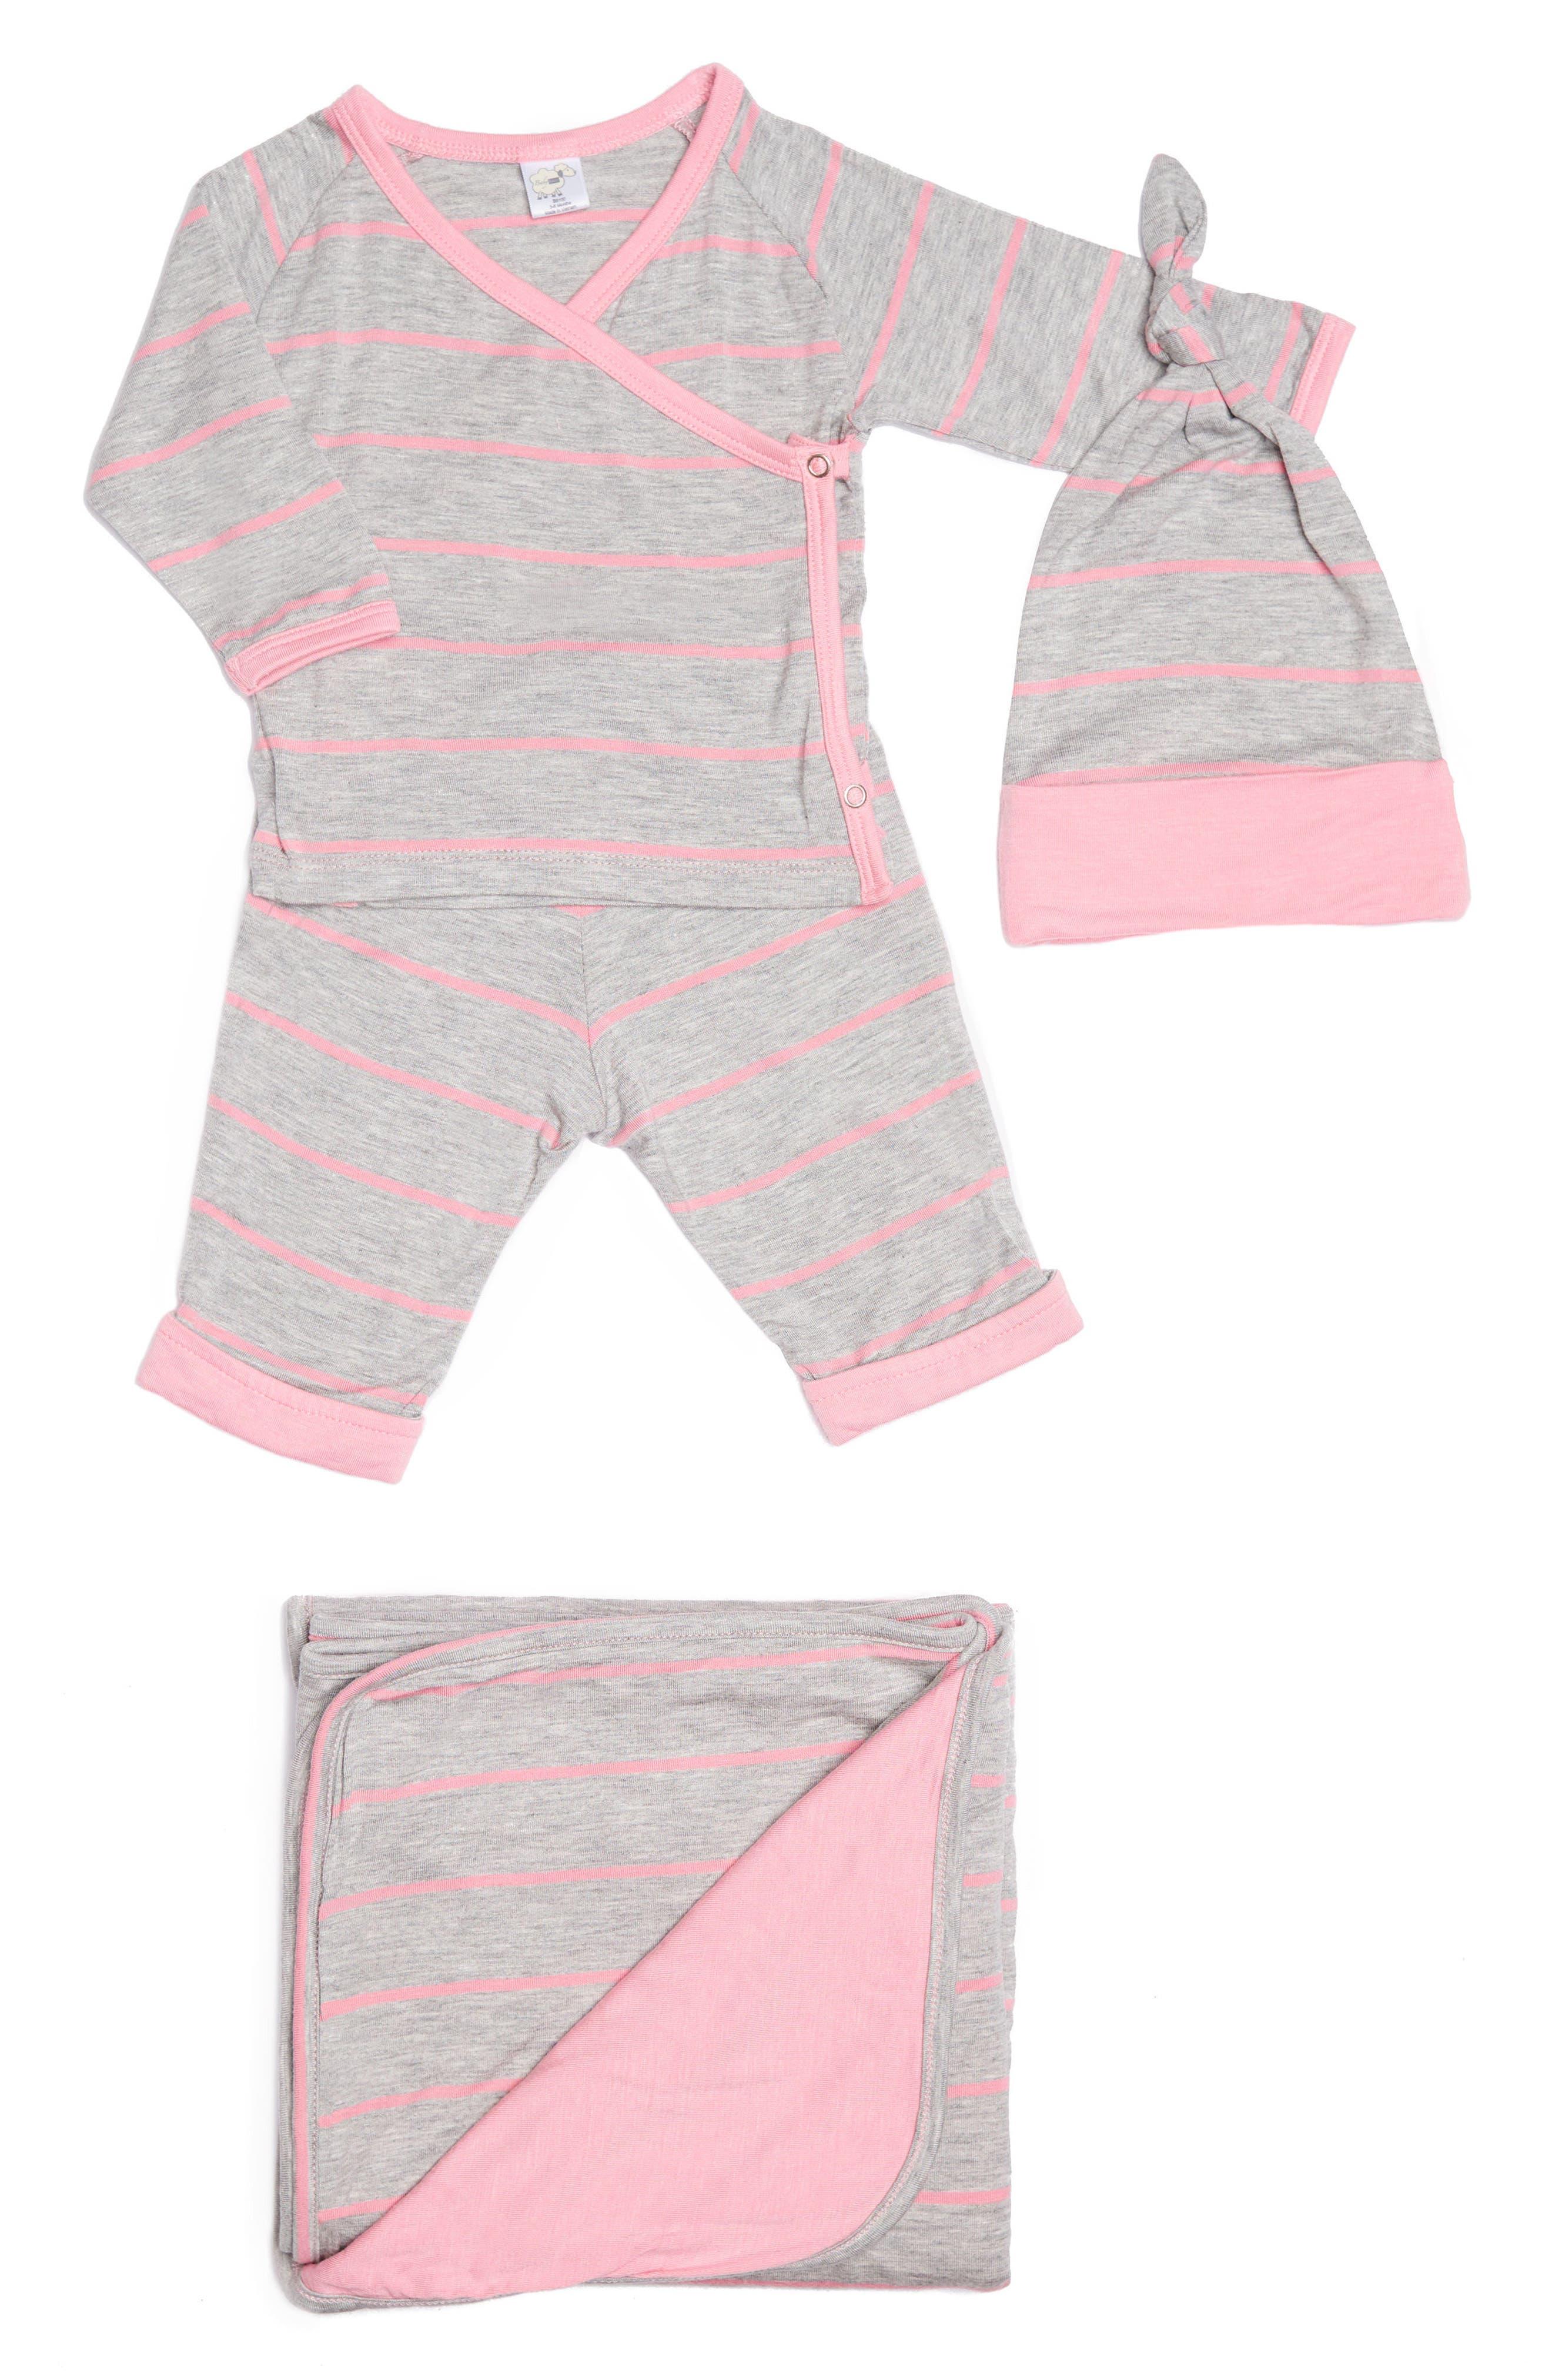 Main Image - Baby Grey Kimono Top, Pants, Beanie & Receiving Blanket Set (Baby Girls)